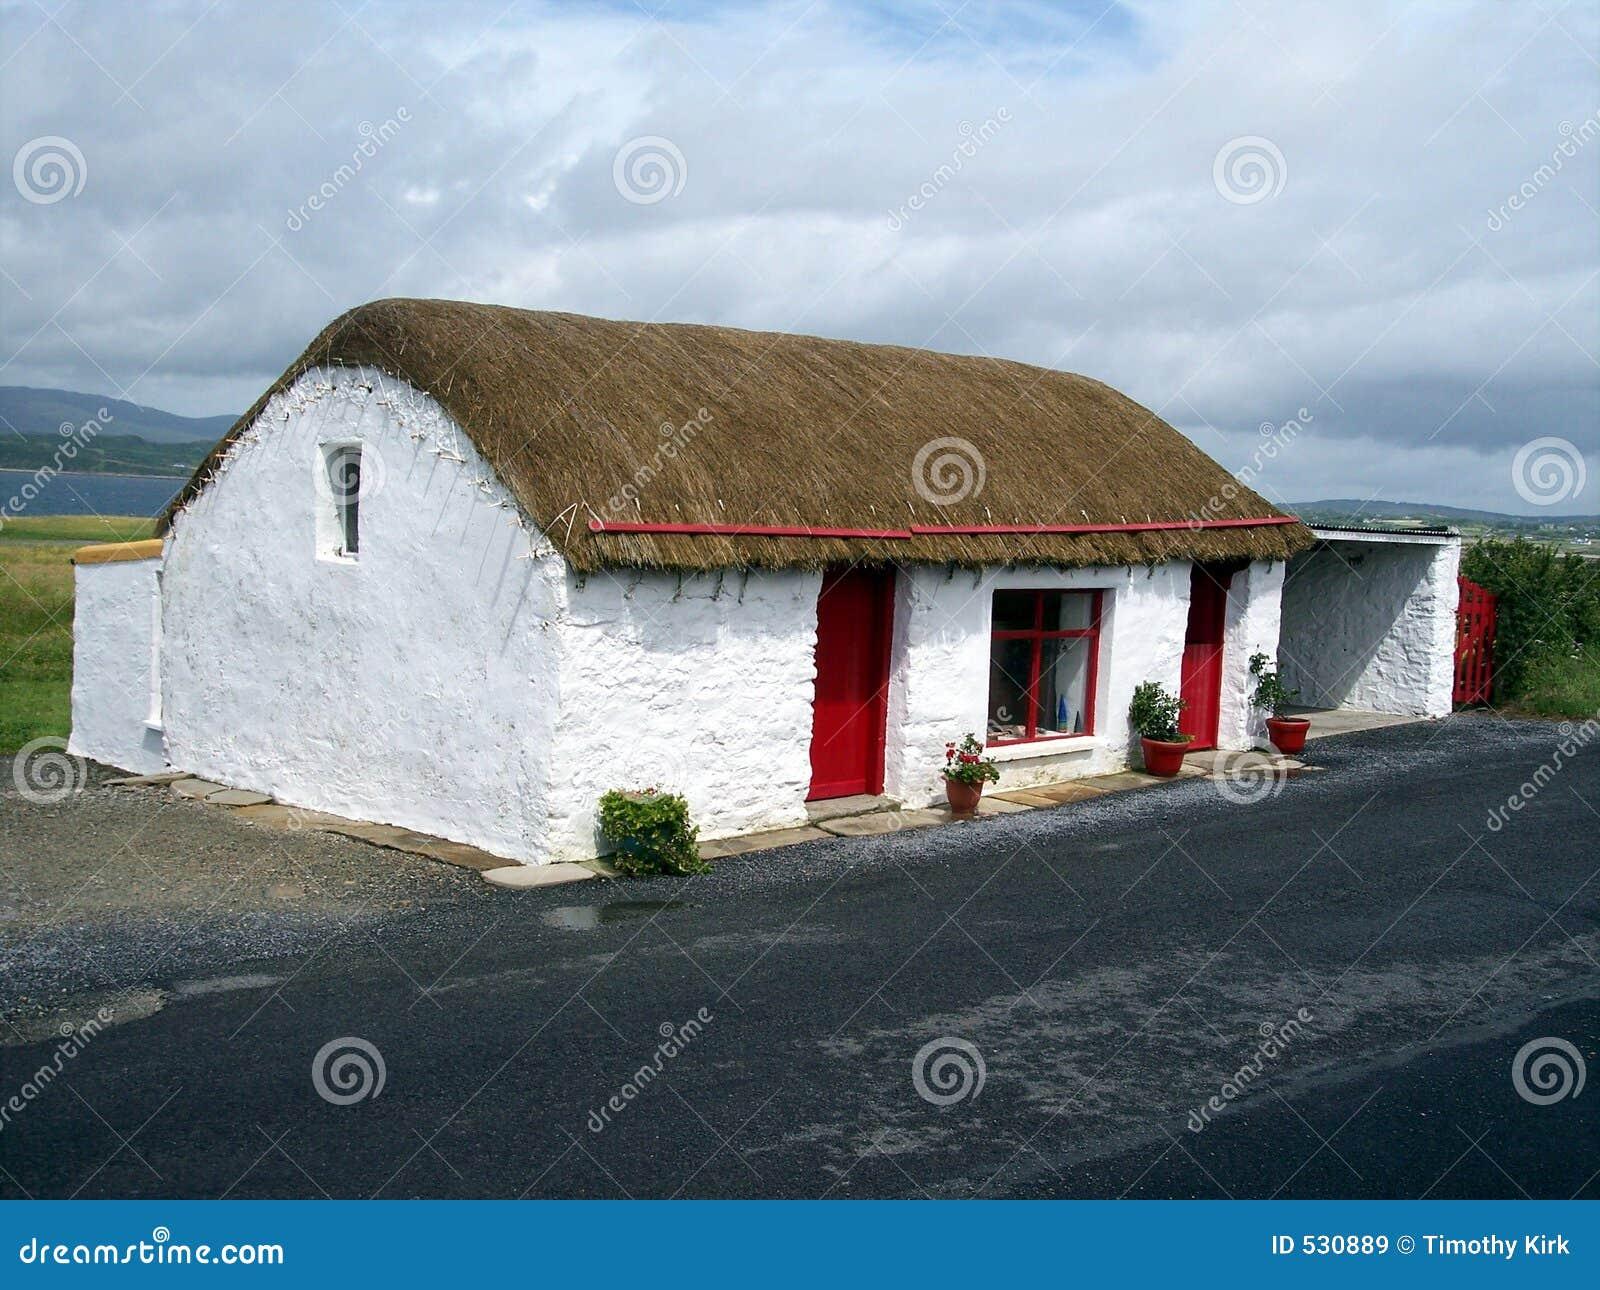 Casa de campo Thatched, Co. Donegal, Ireland